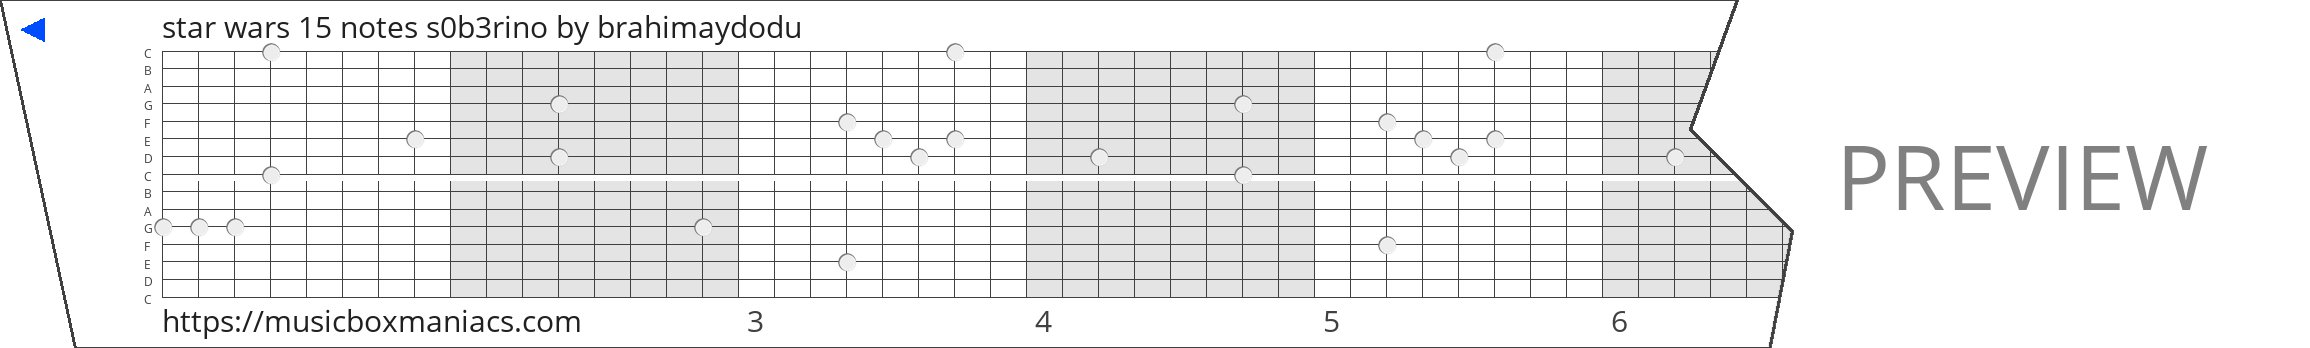 star wars 15 notes s0b3rino 15 note music box paper strip